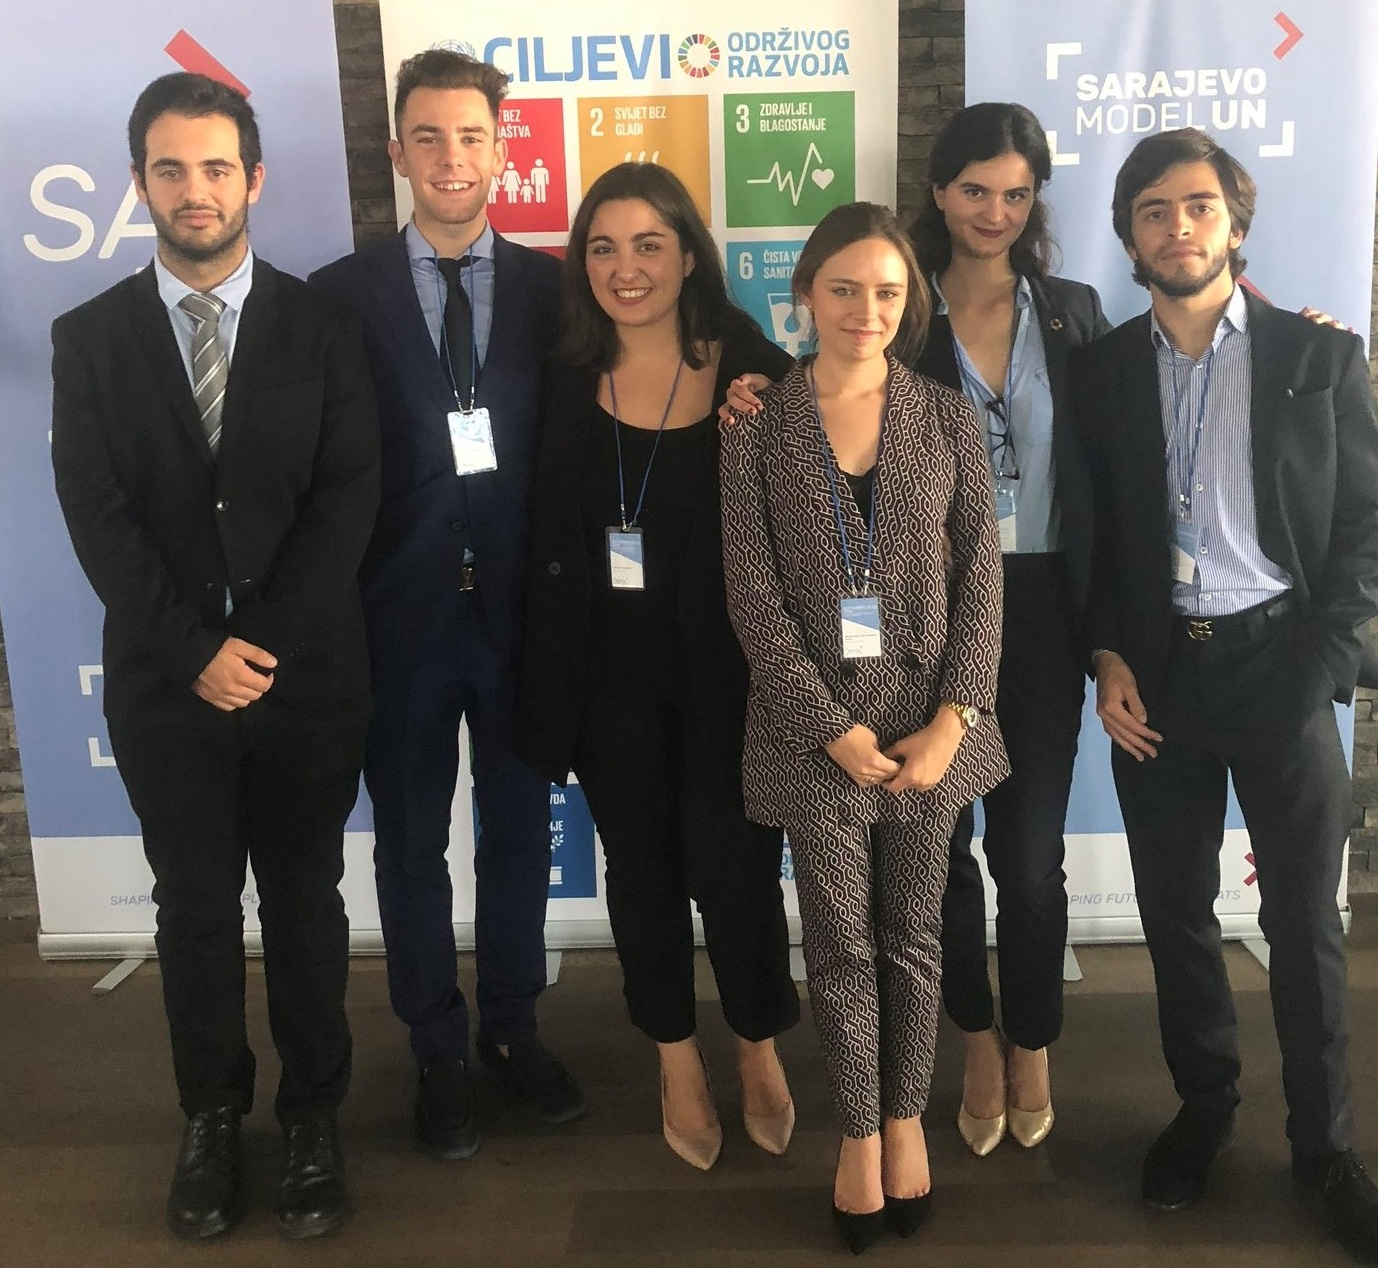 Participants+-+Sarajevo+Model+UN+2018